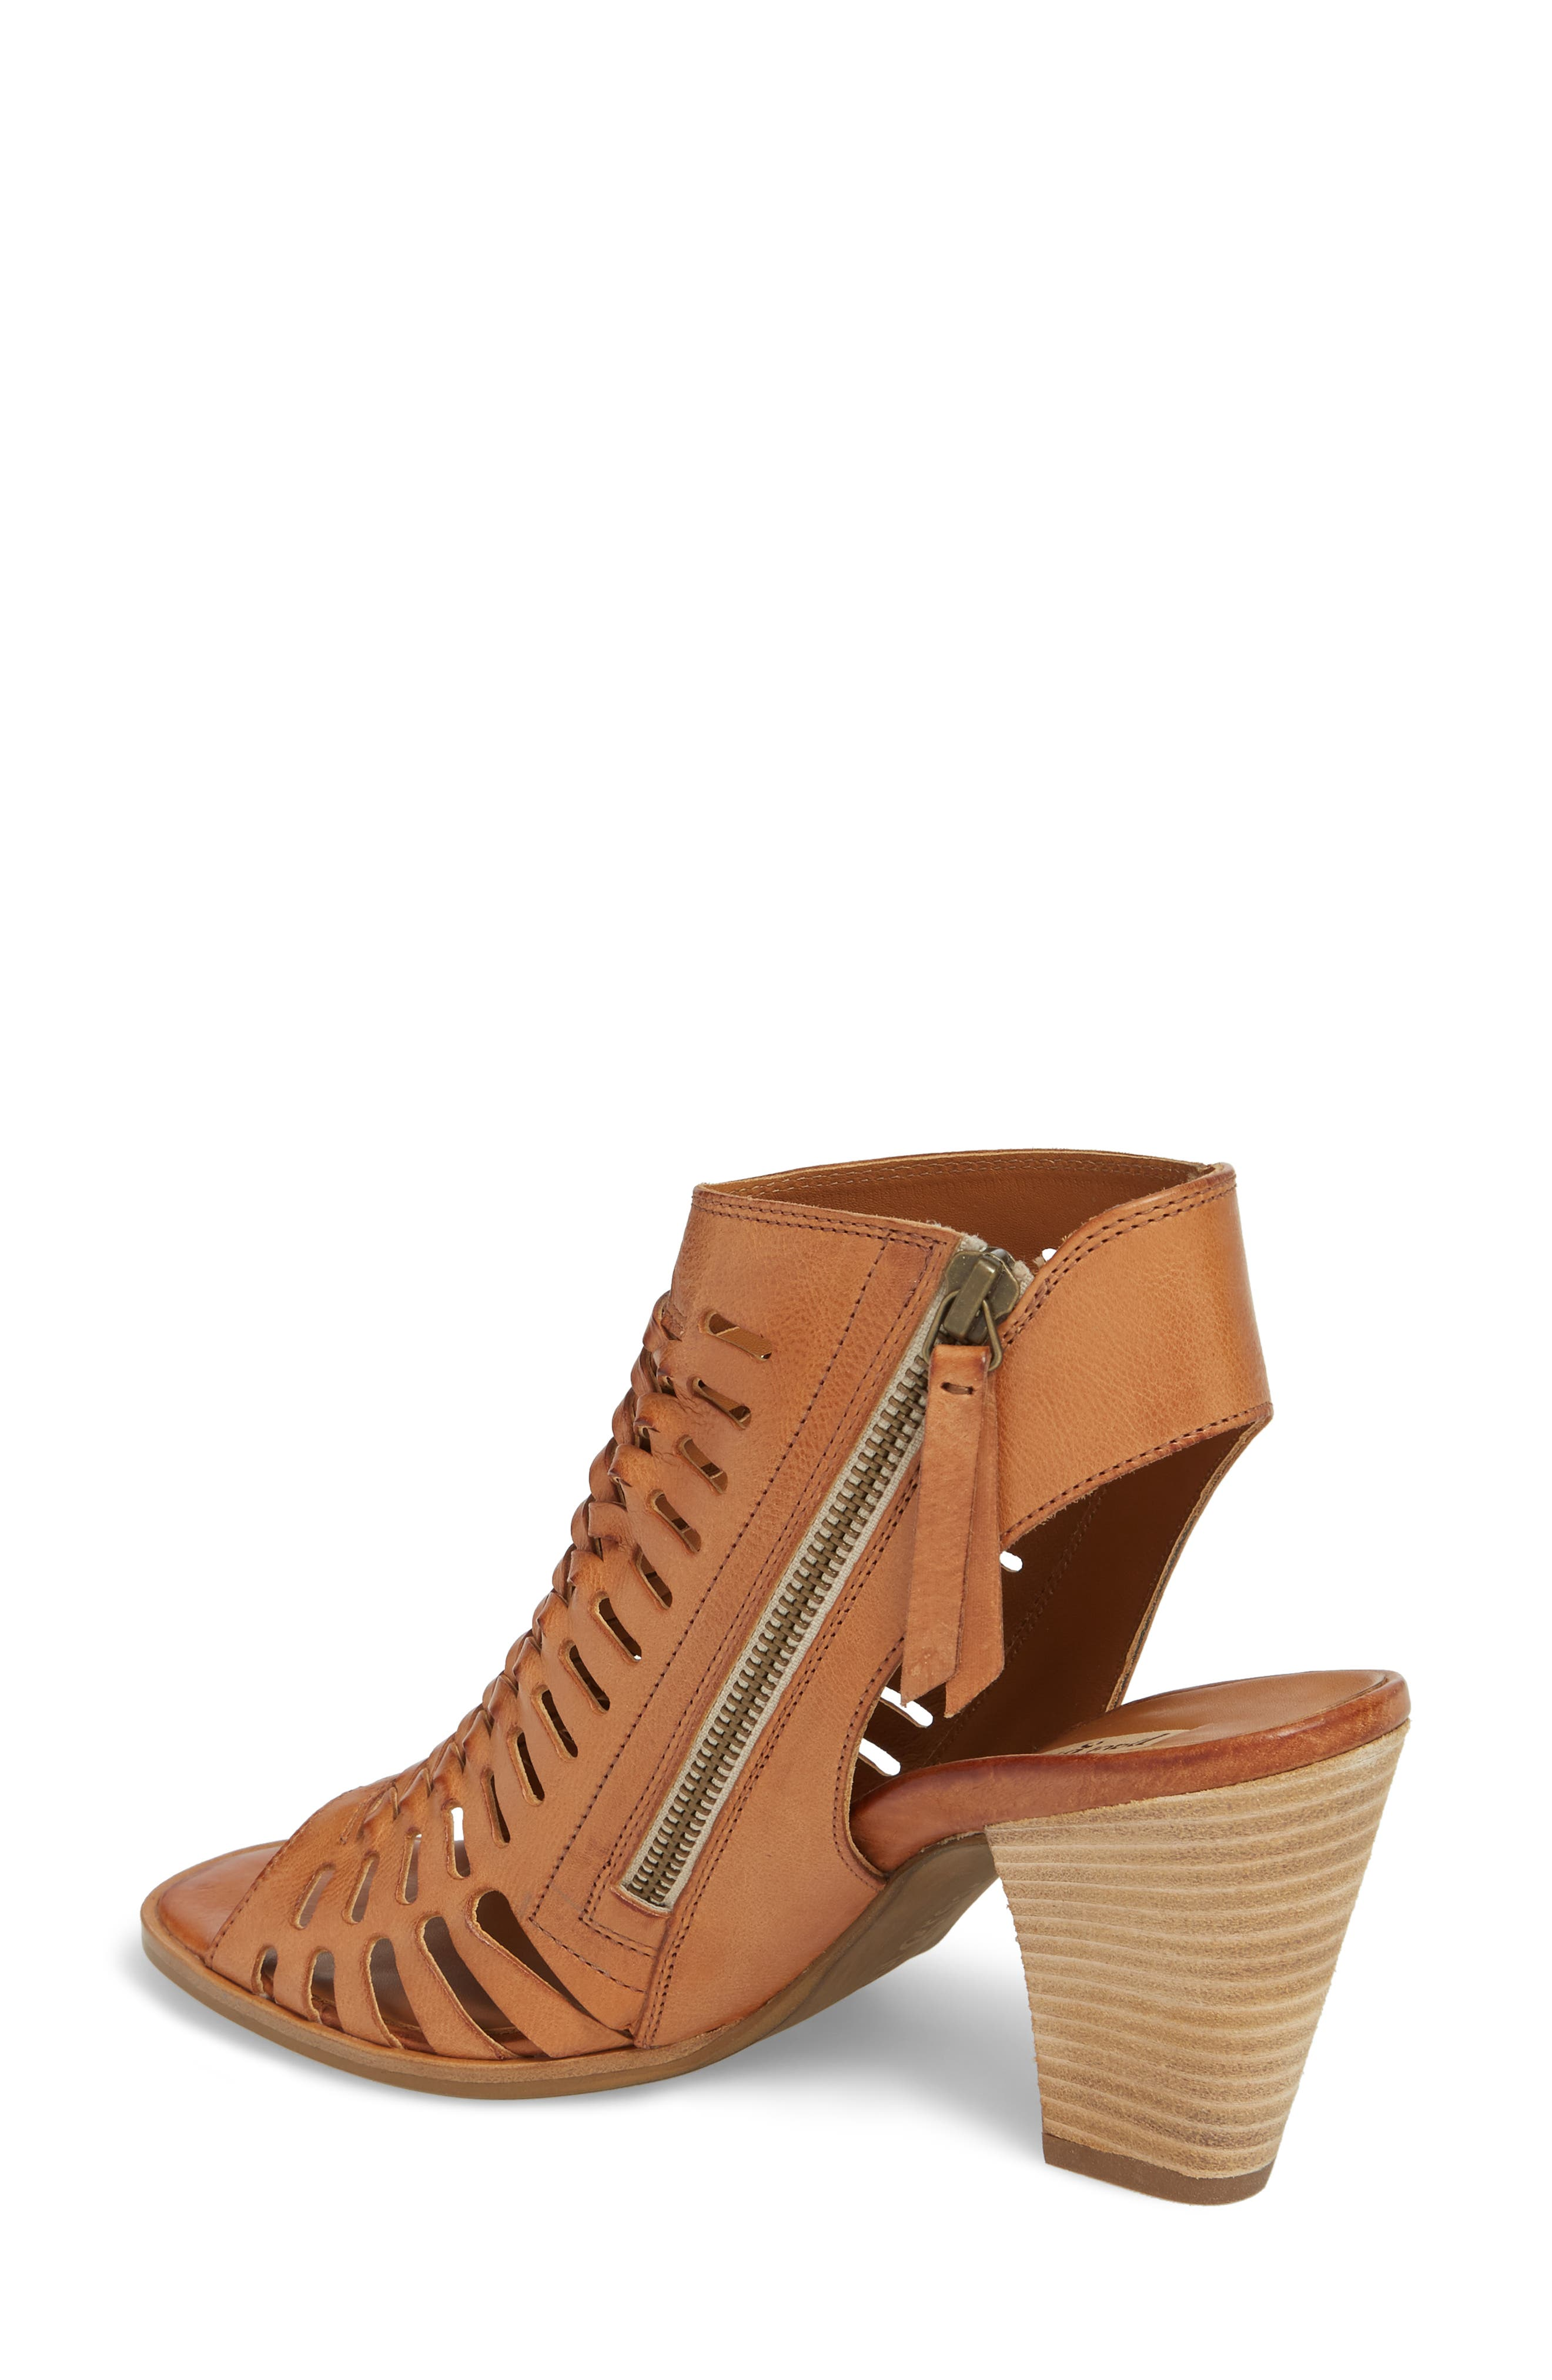 Rosa Woven Peep Toe Sandal,                             Alternate thumbnail 2, color,                             Cuoio Leather